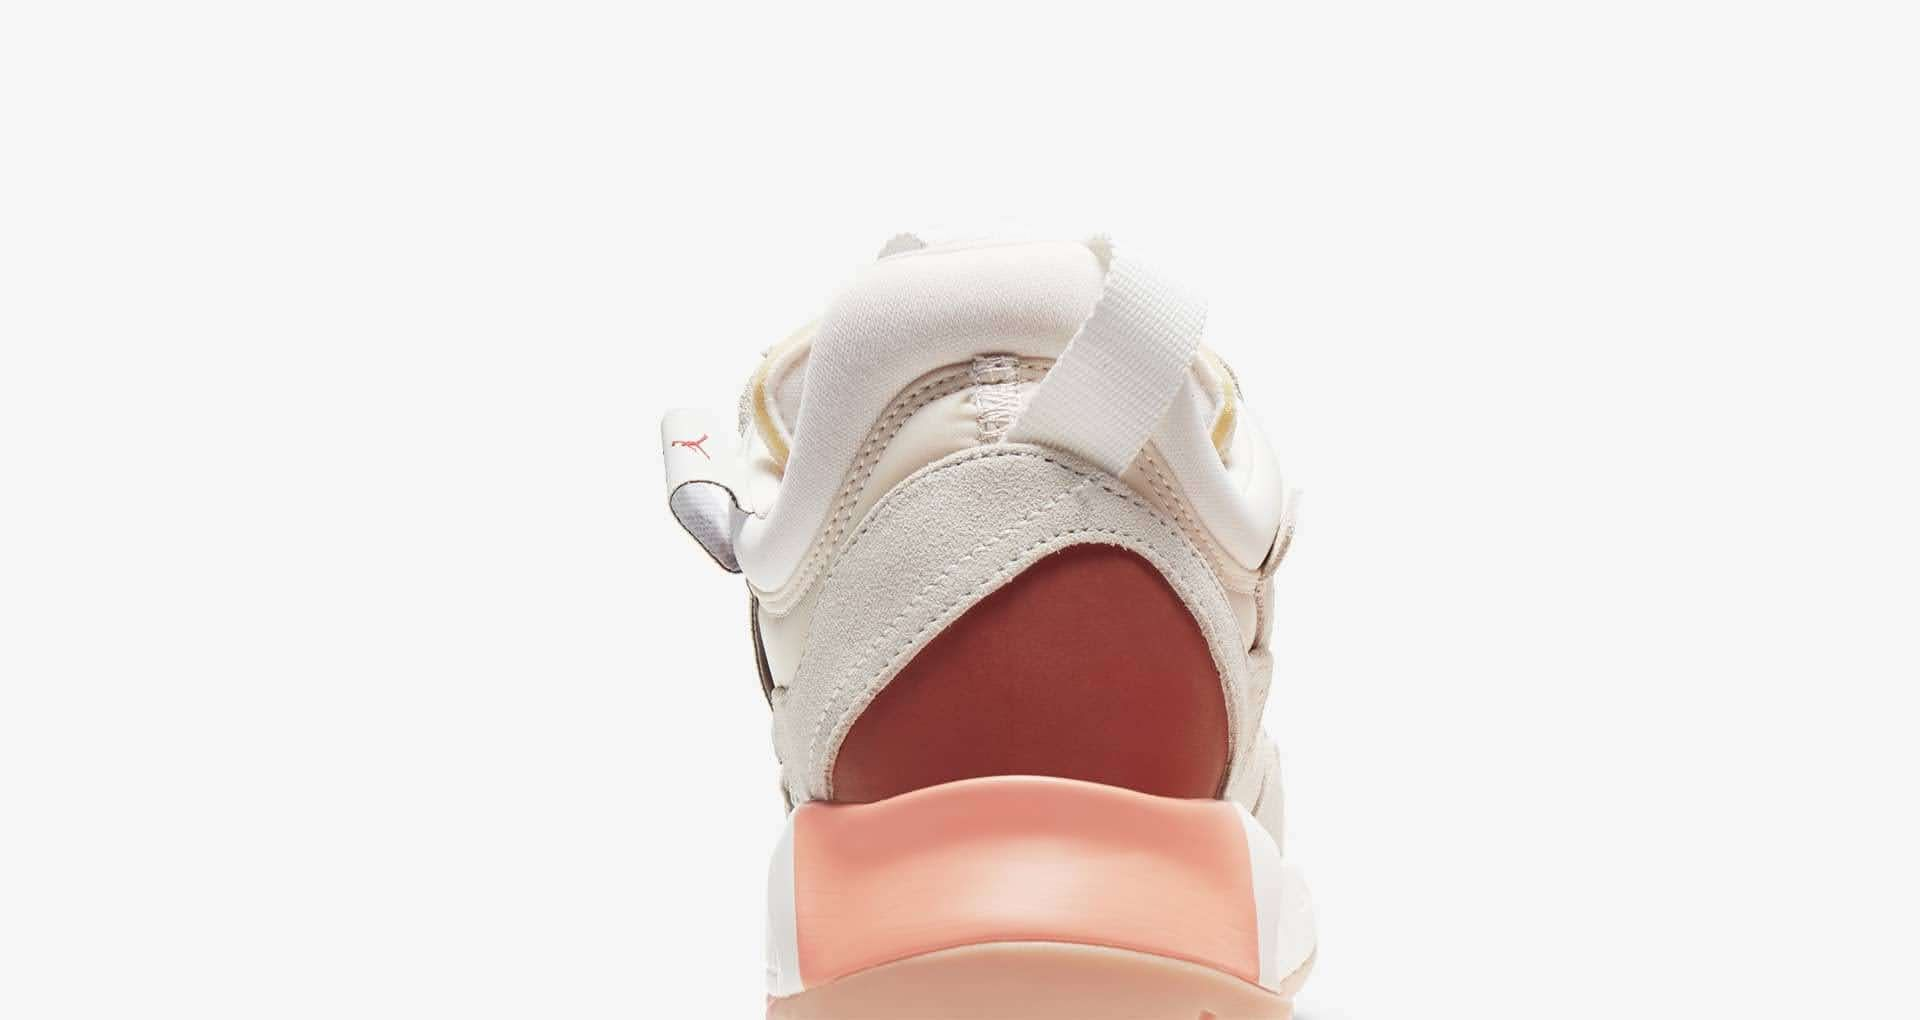 Nike-jordan-brand-ma-2-air-max-200-and-women-s-future-primal-apparel nike-womens-jordan-ma2-future-beginnings-DC7729-100-heel-close-up